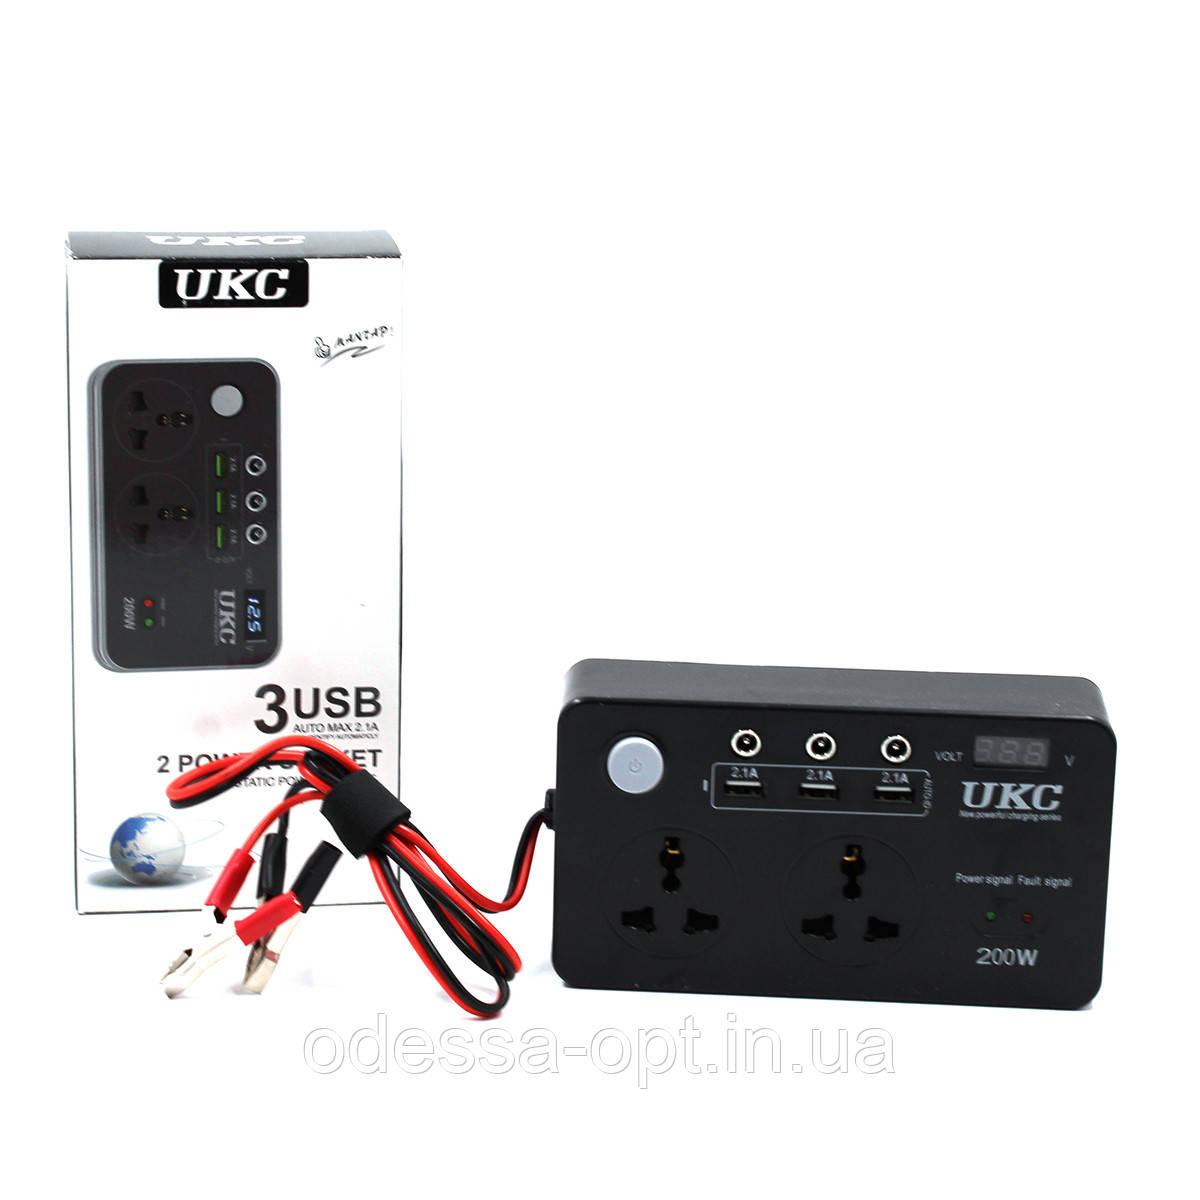 Inverter 200W with 2 socket/ 3 usb